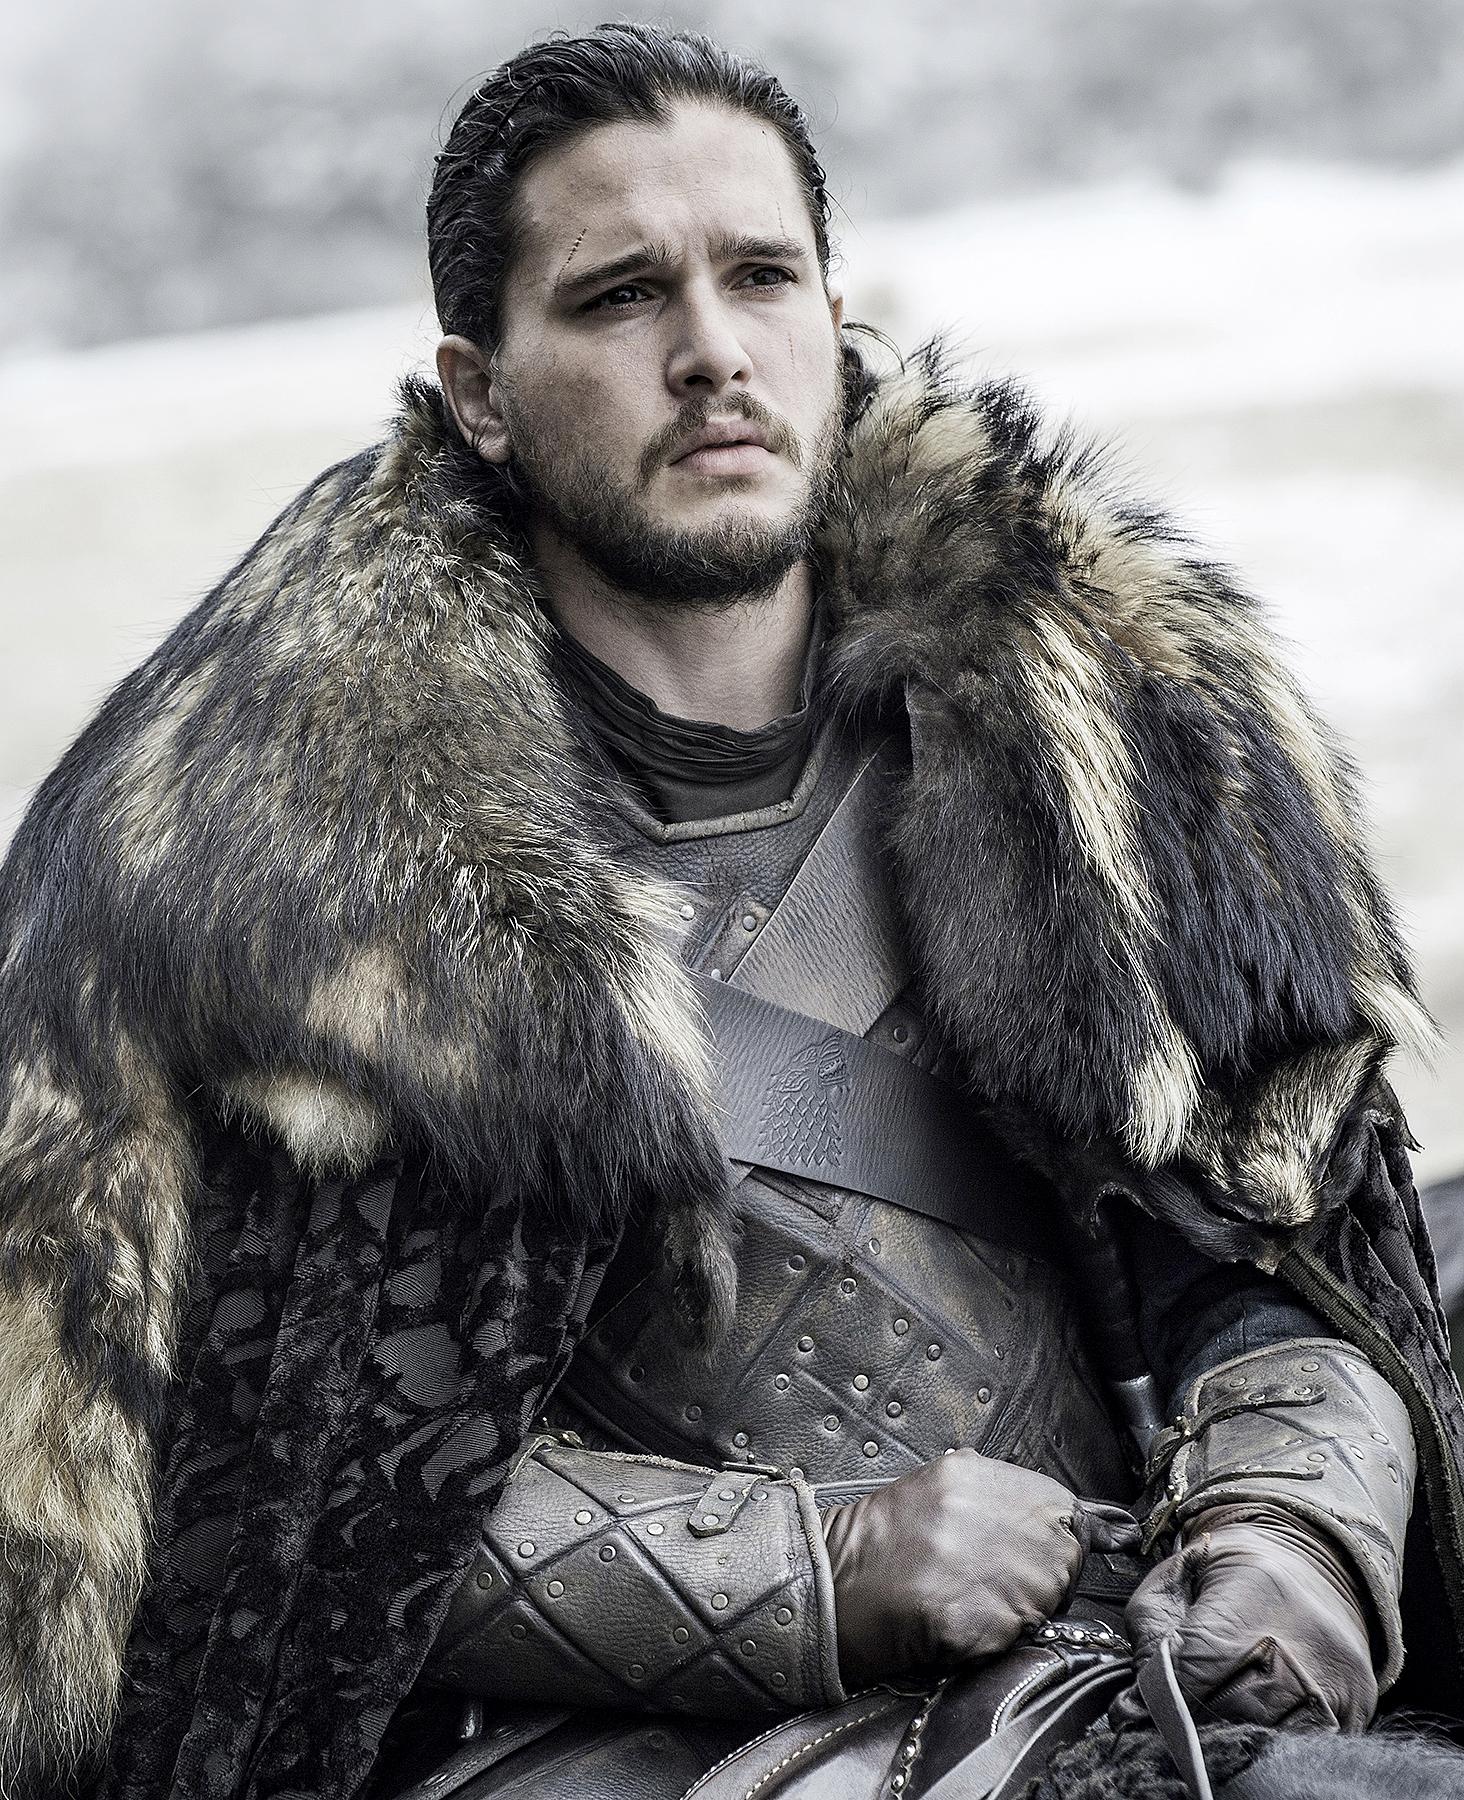 Kit Harington as Jon Snow on Game of Thrones.